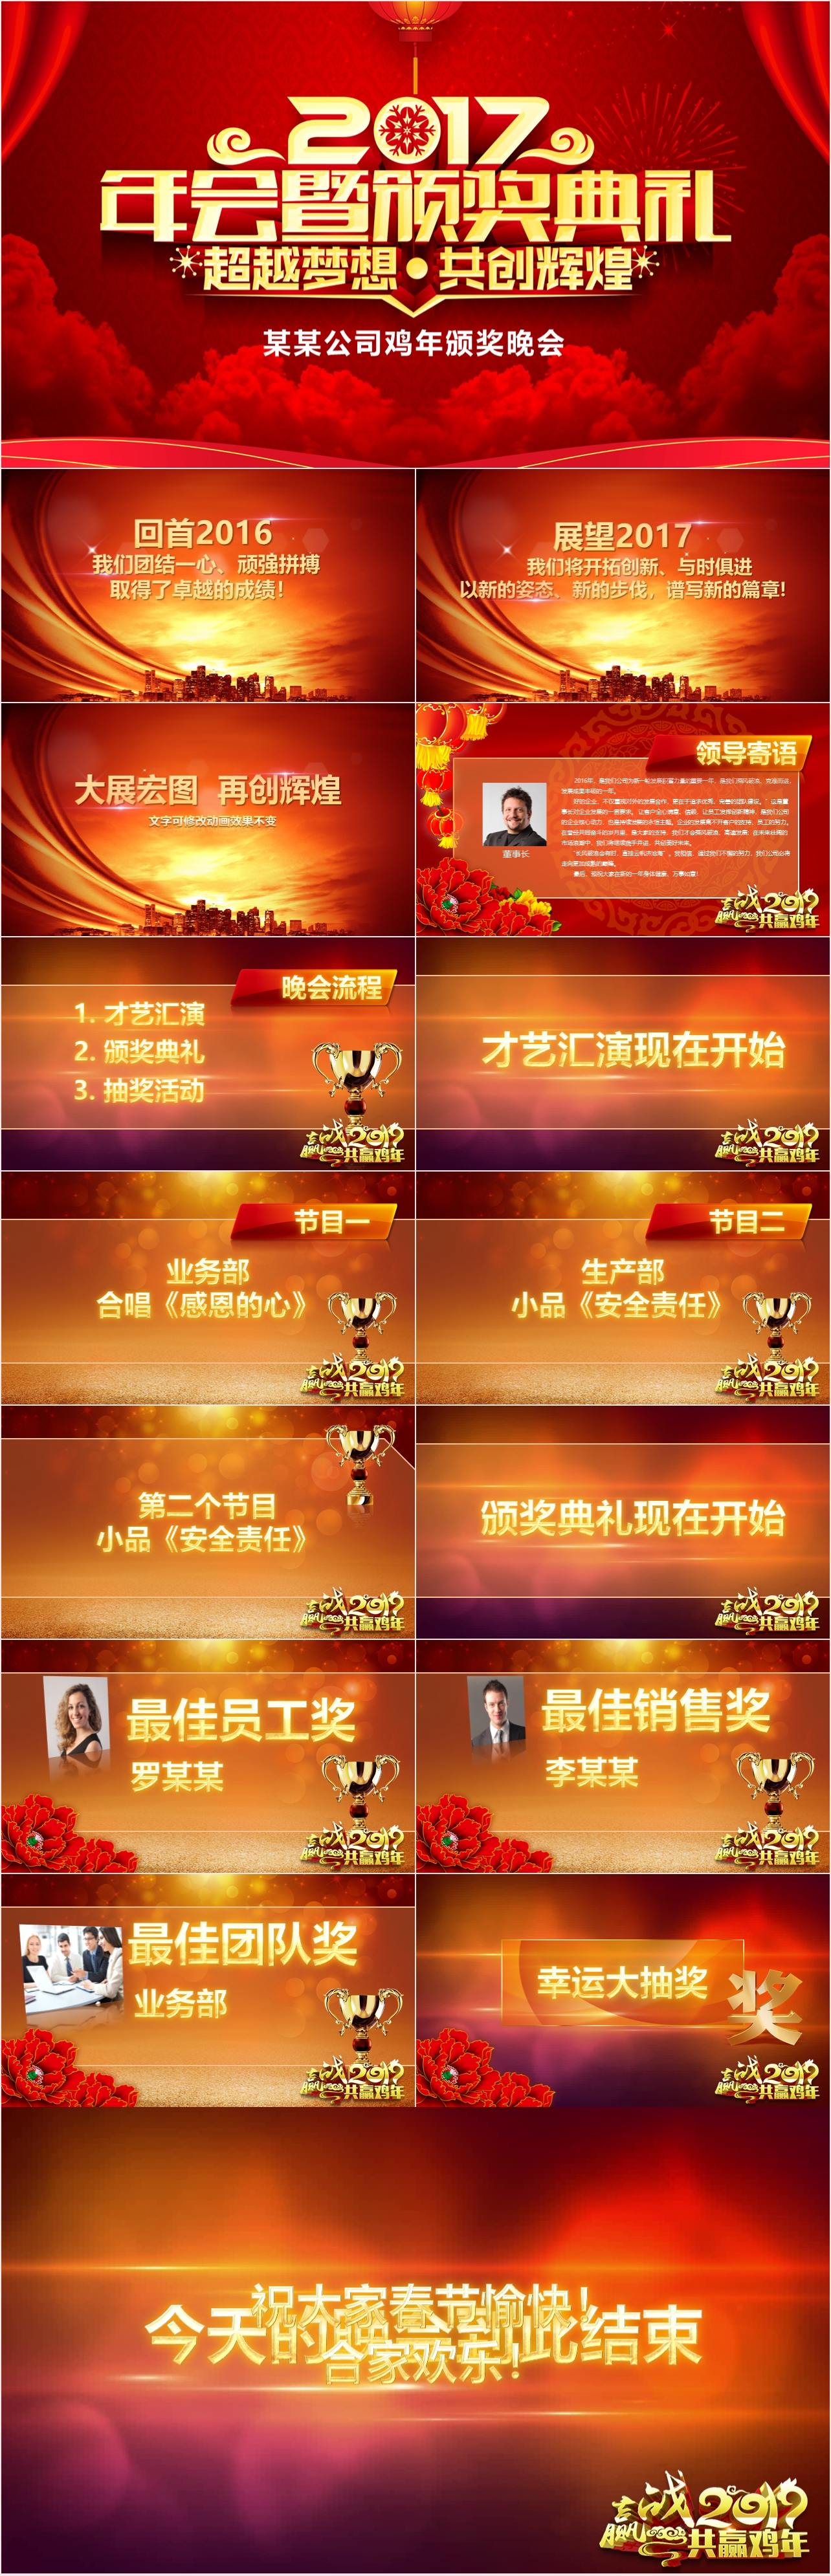 BC0125 鸡年颁奖晚会PPT模板